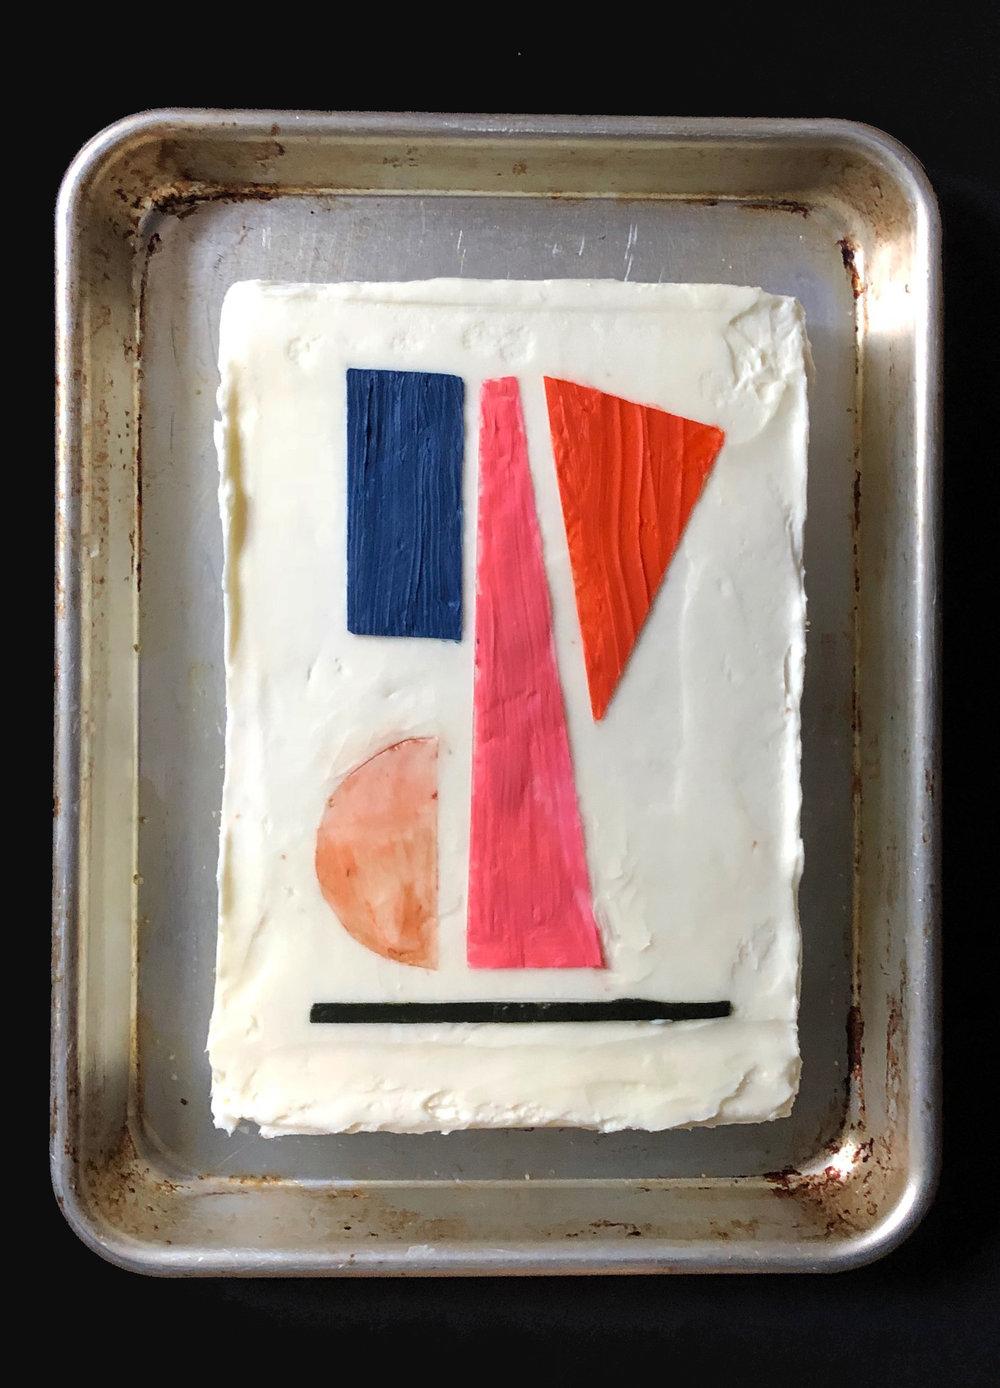 """Balance"" - A vanilla-vanilla cake version of Balance by artist Berit Mogensen Lopez"